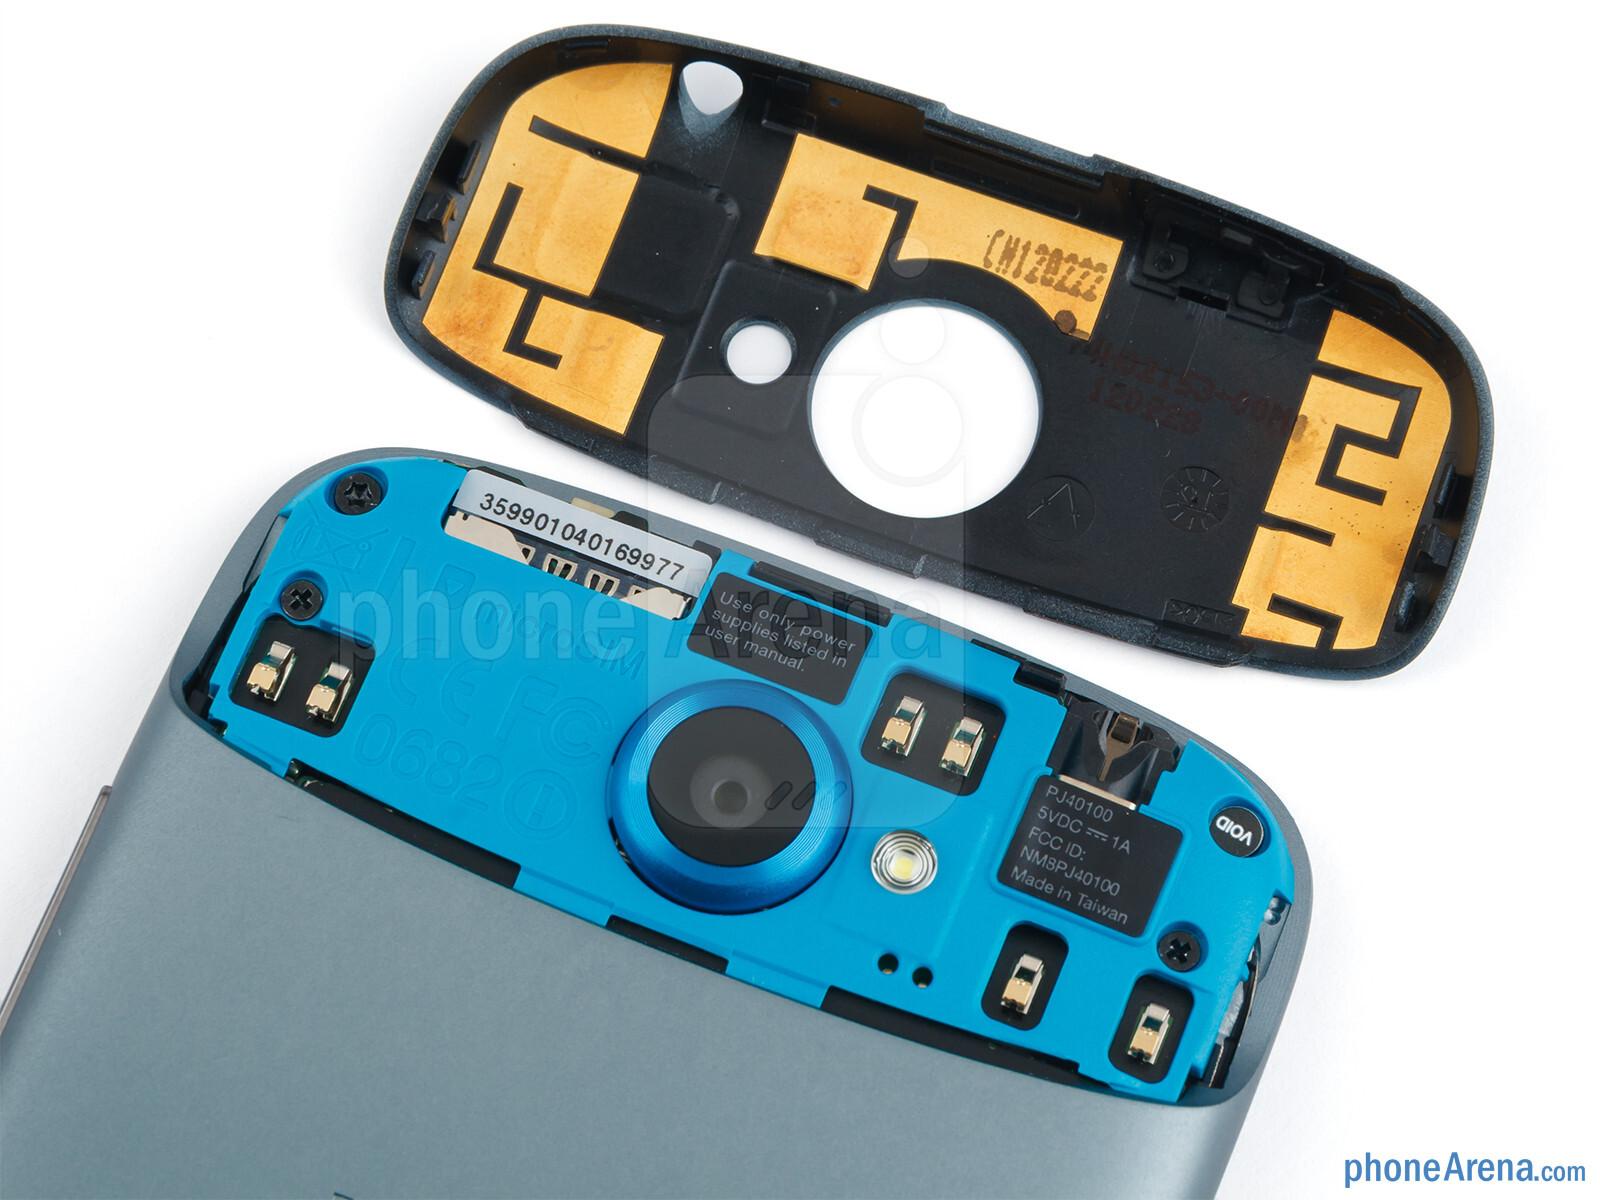 Do verizon iphone 4s have sim card slots